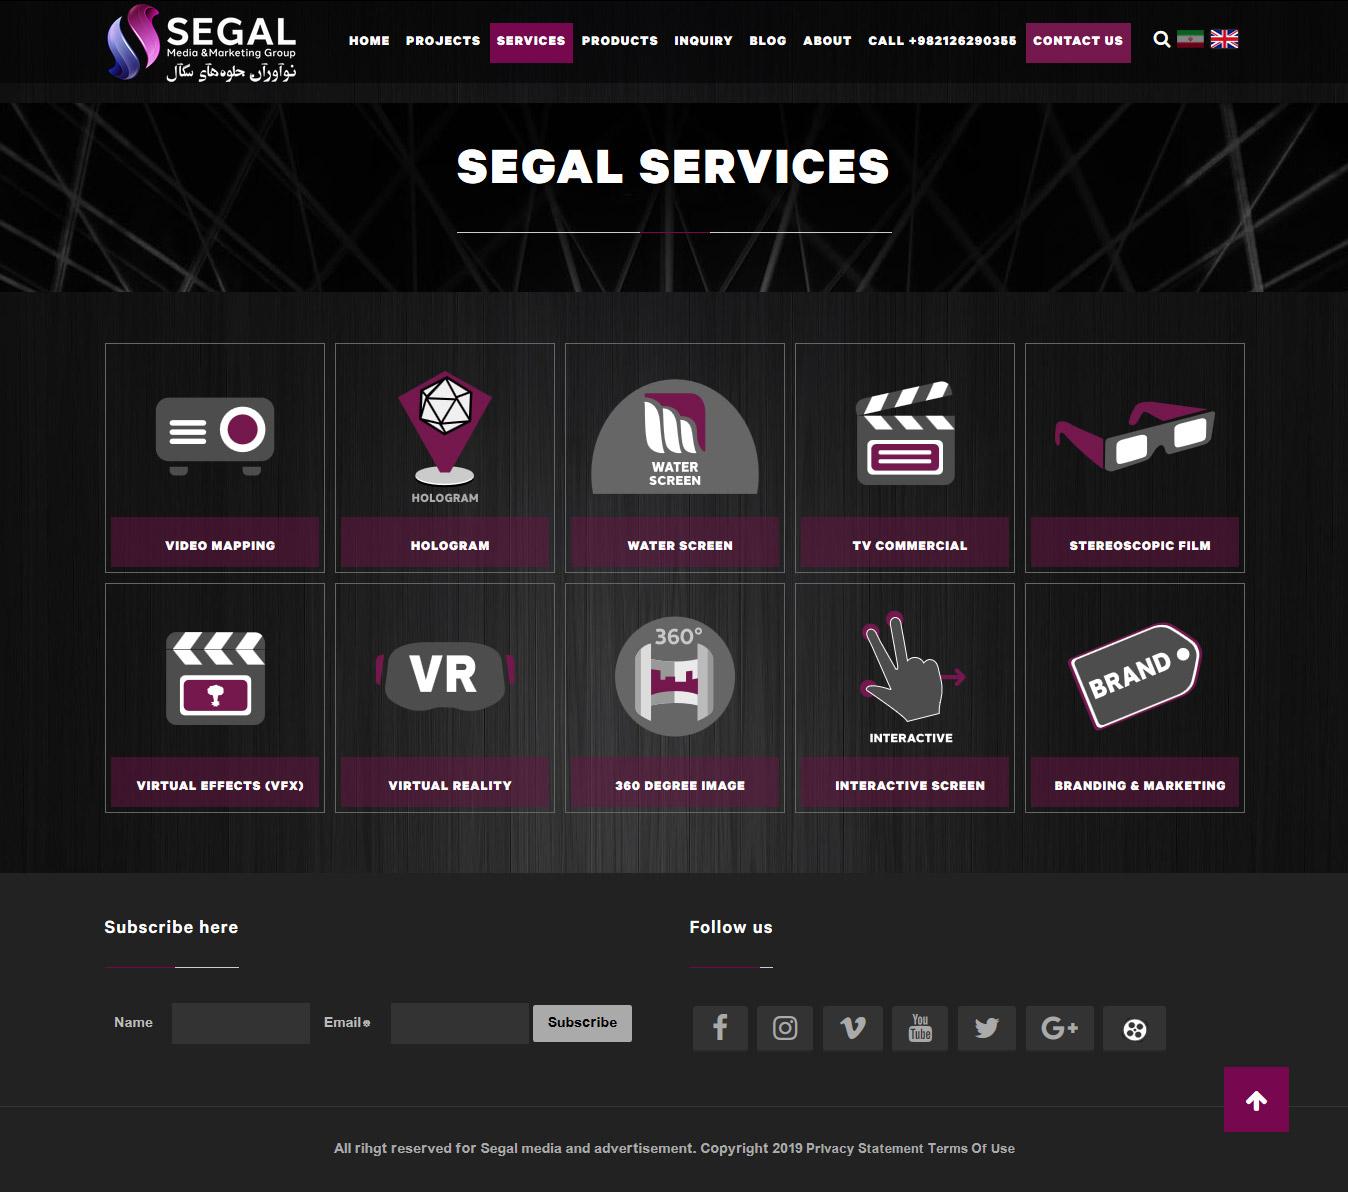 segalmedia-net-en-Services